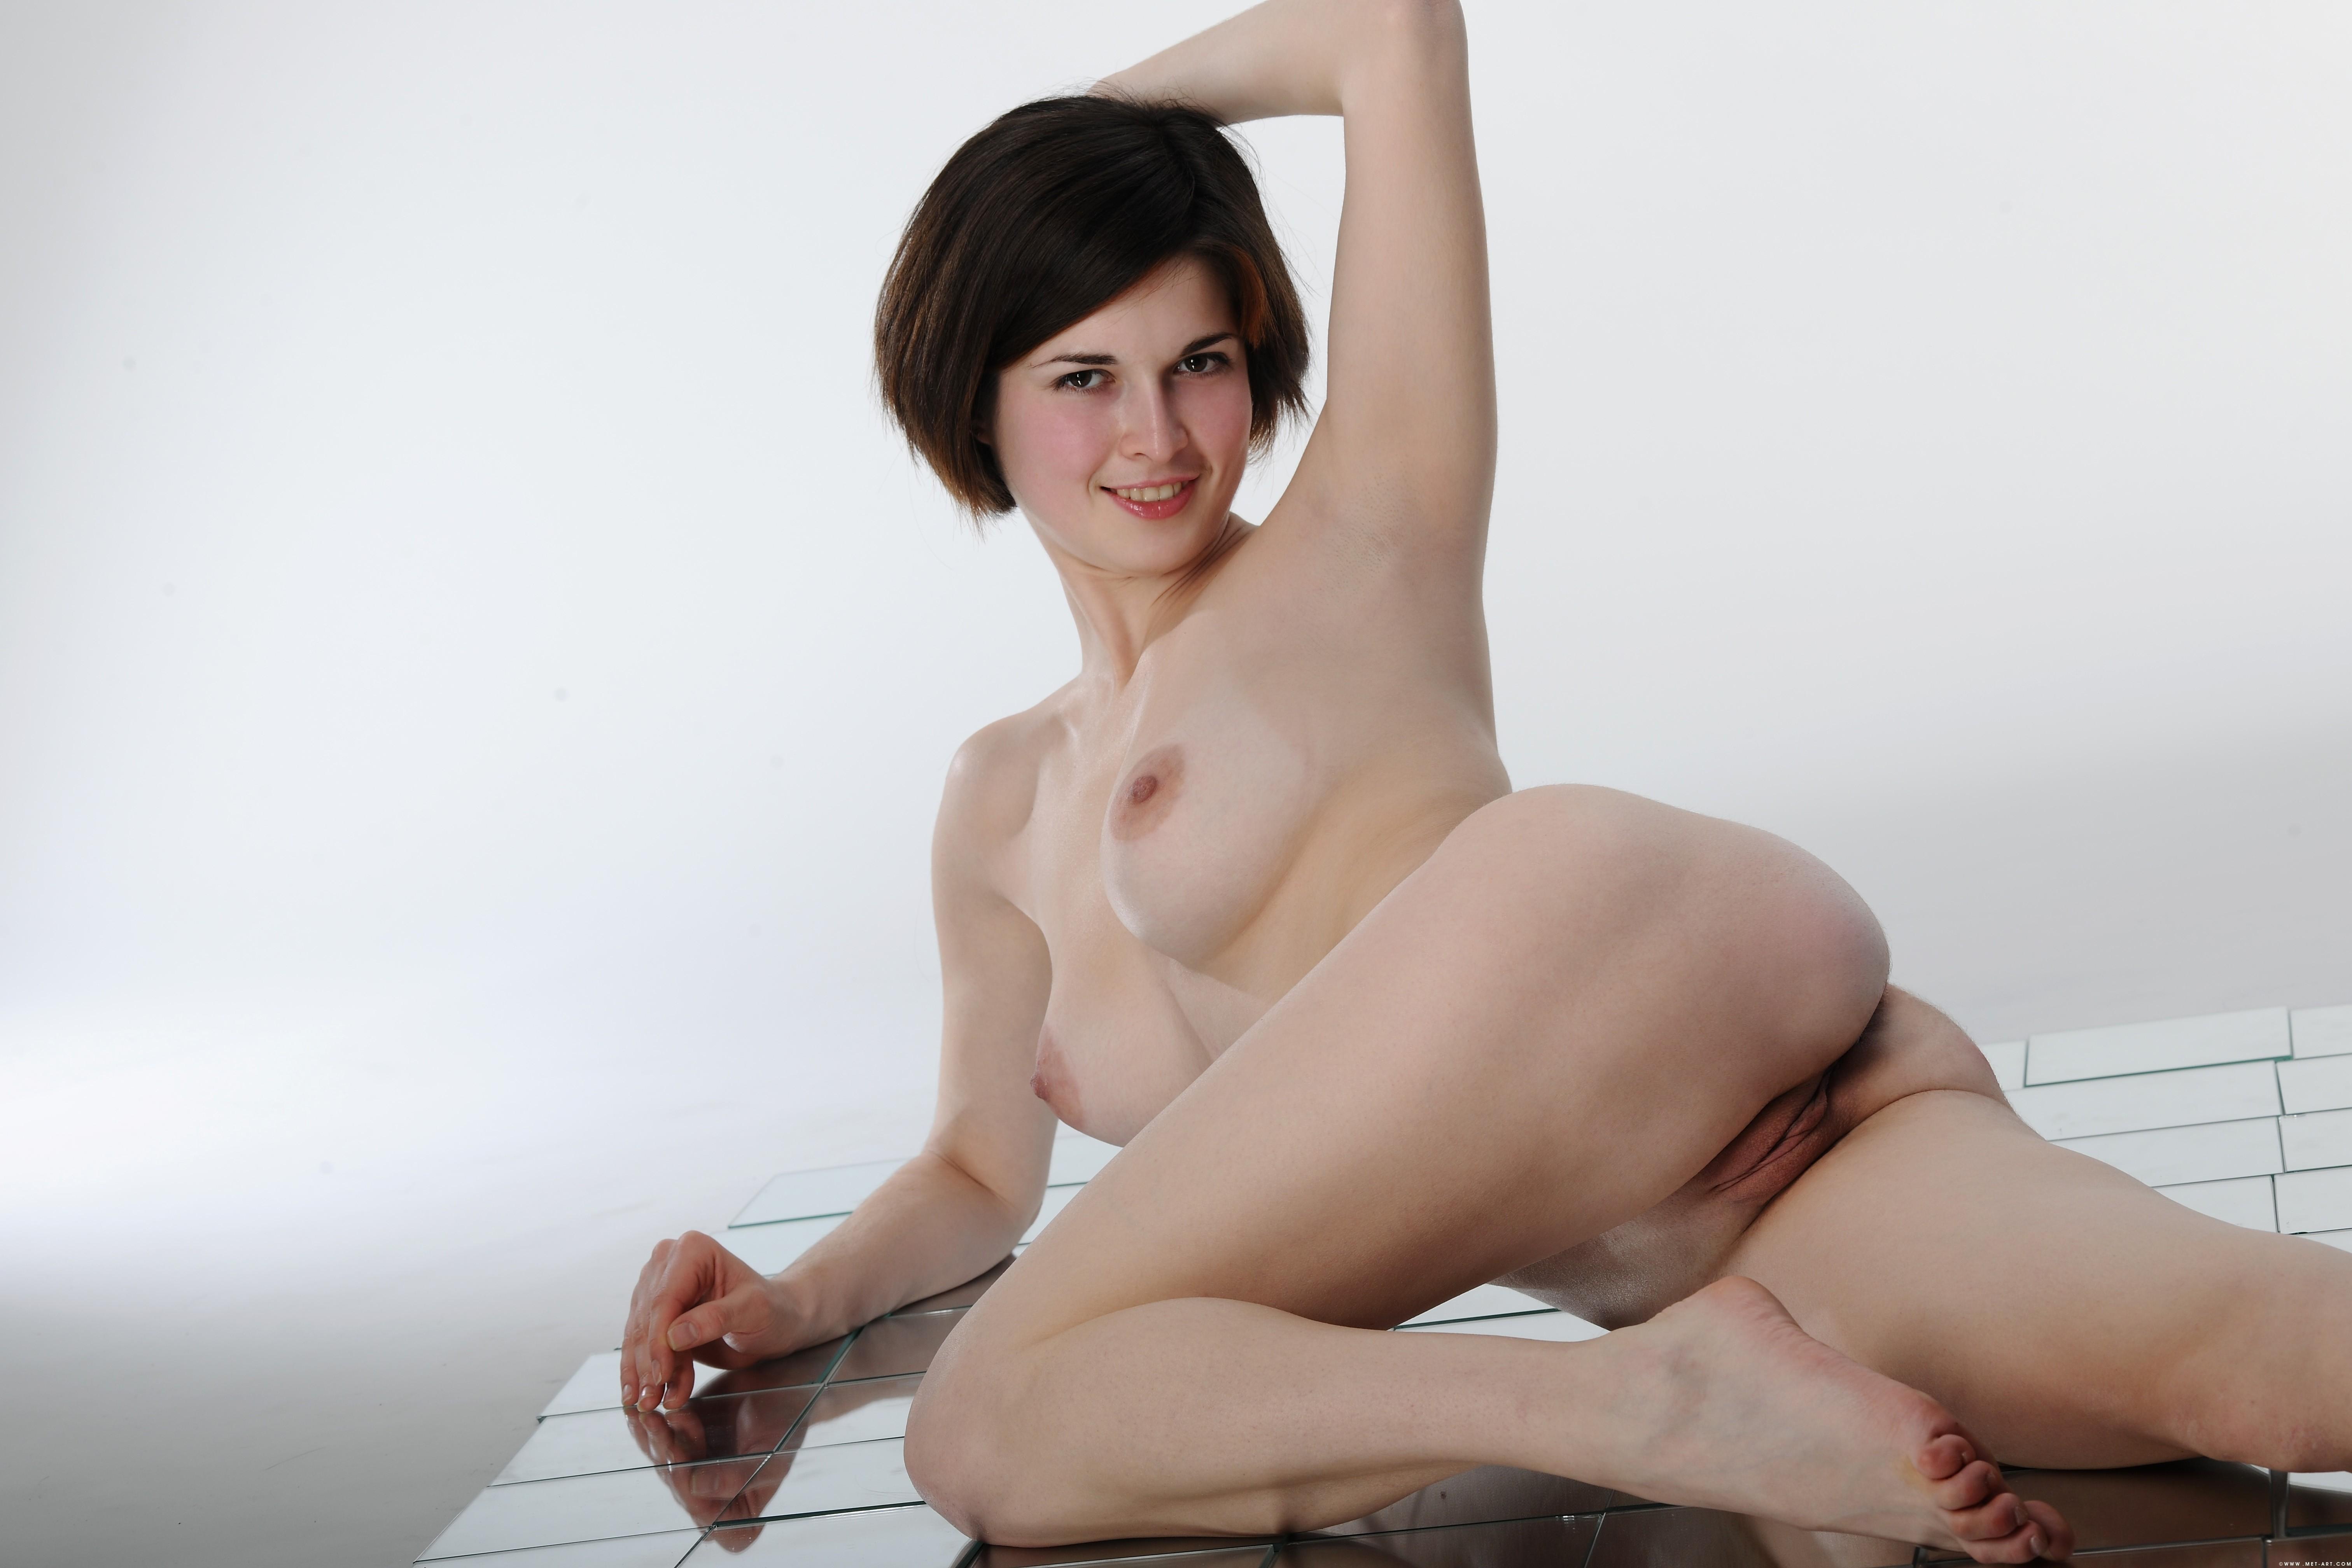 frantsuzskiy-devushki-foto-golie